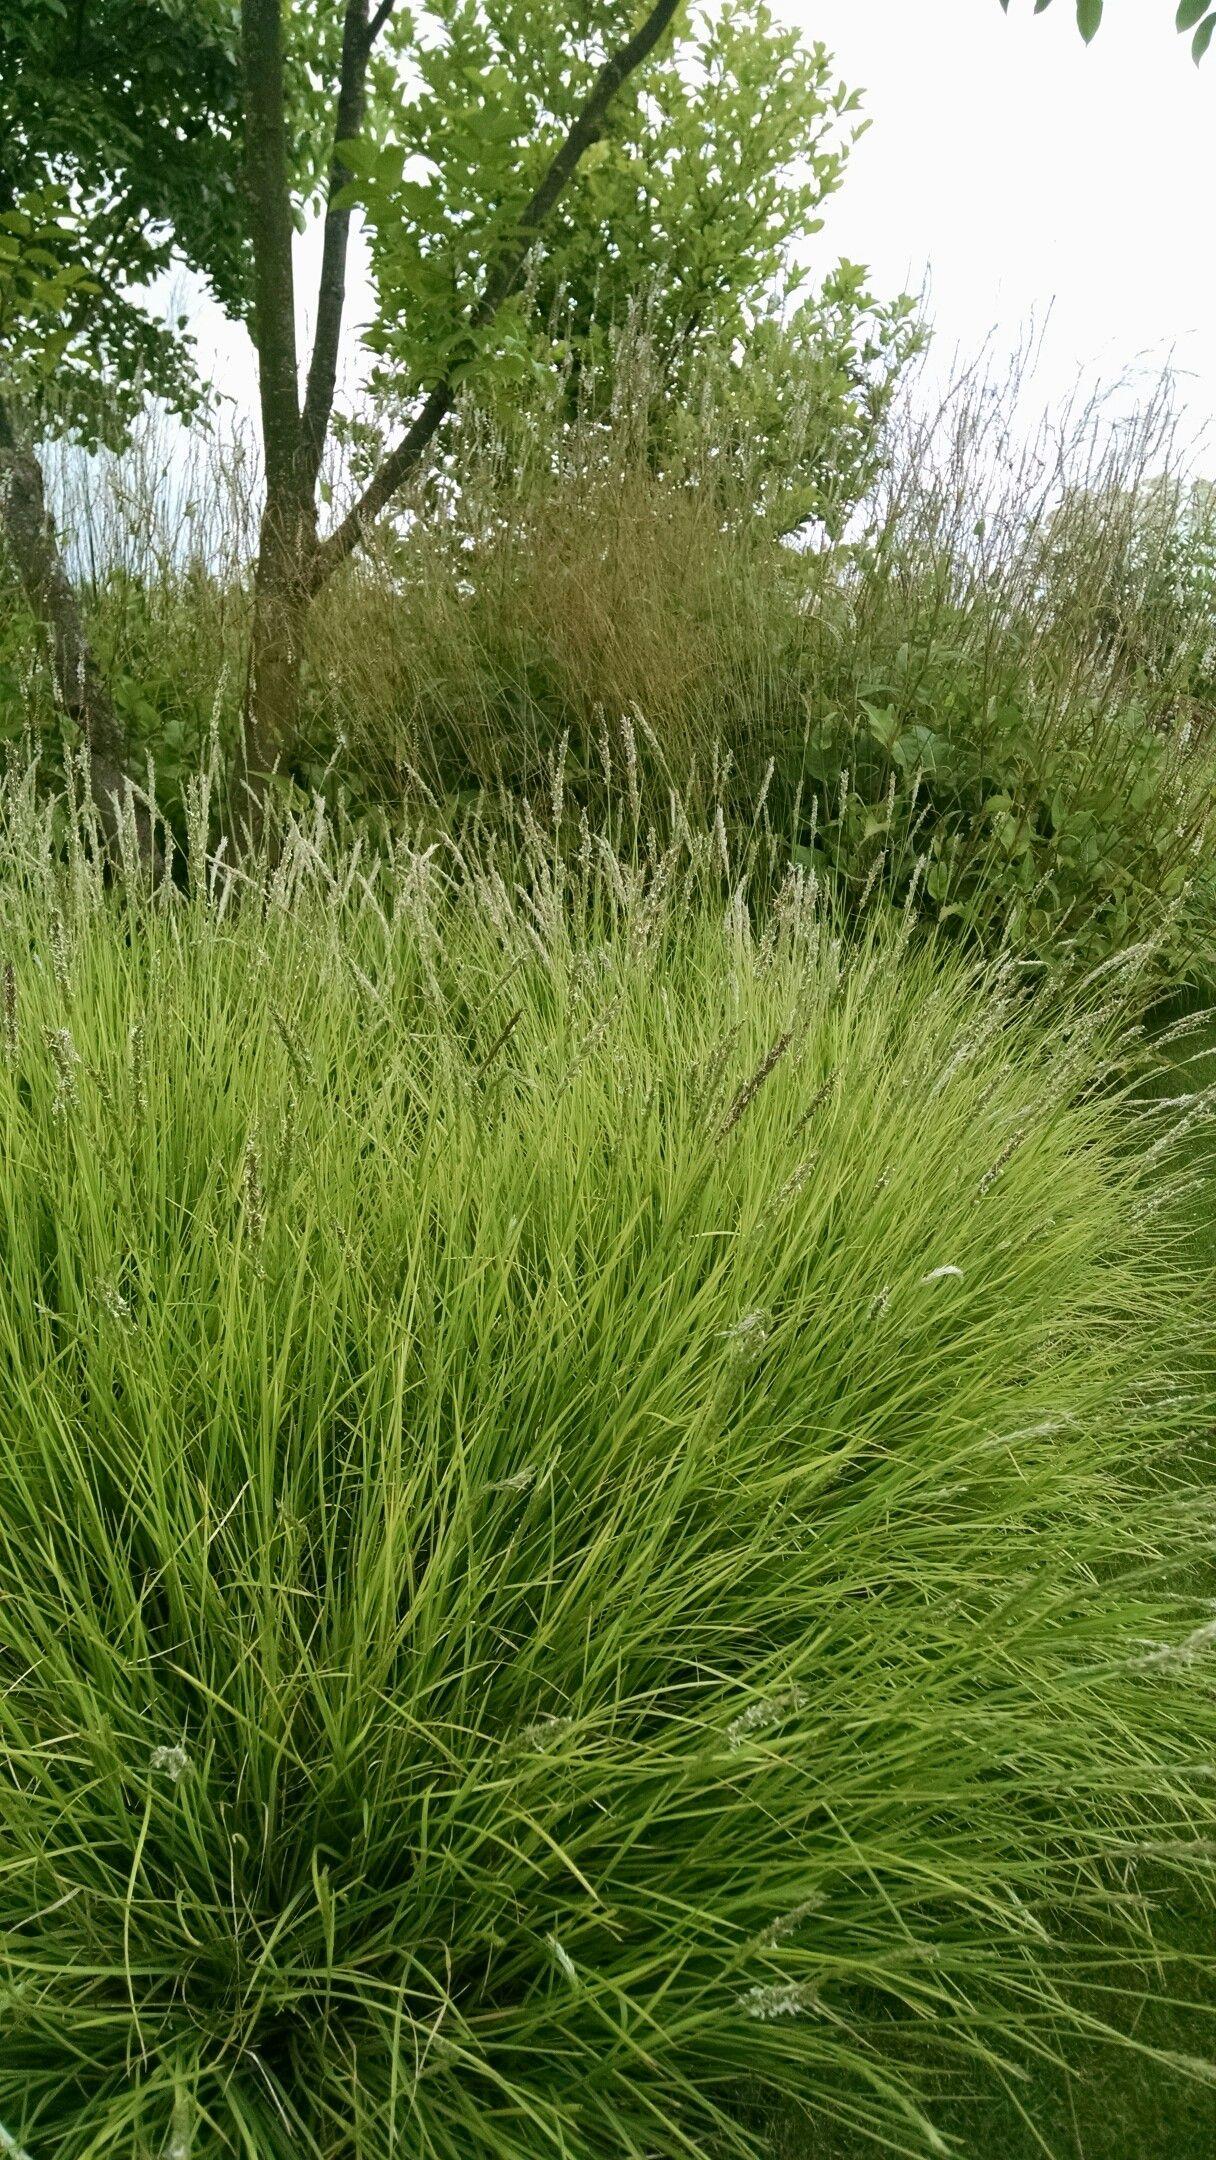 Carex vlinderhof gramineus pinterest grasses and gardens